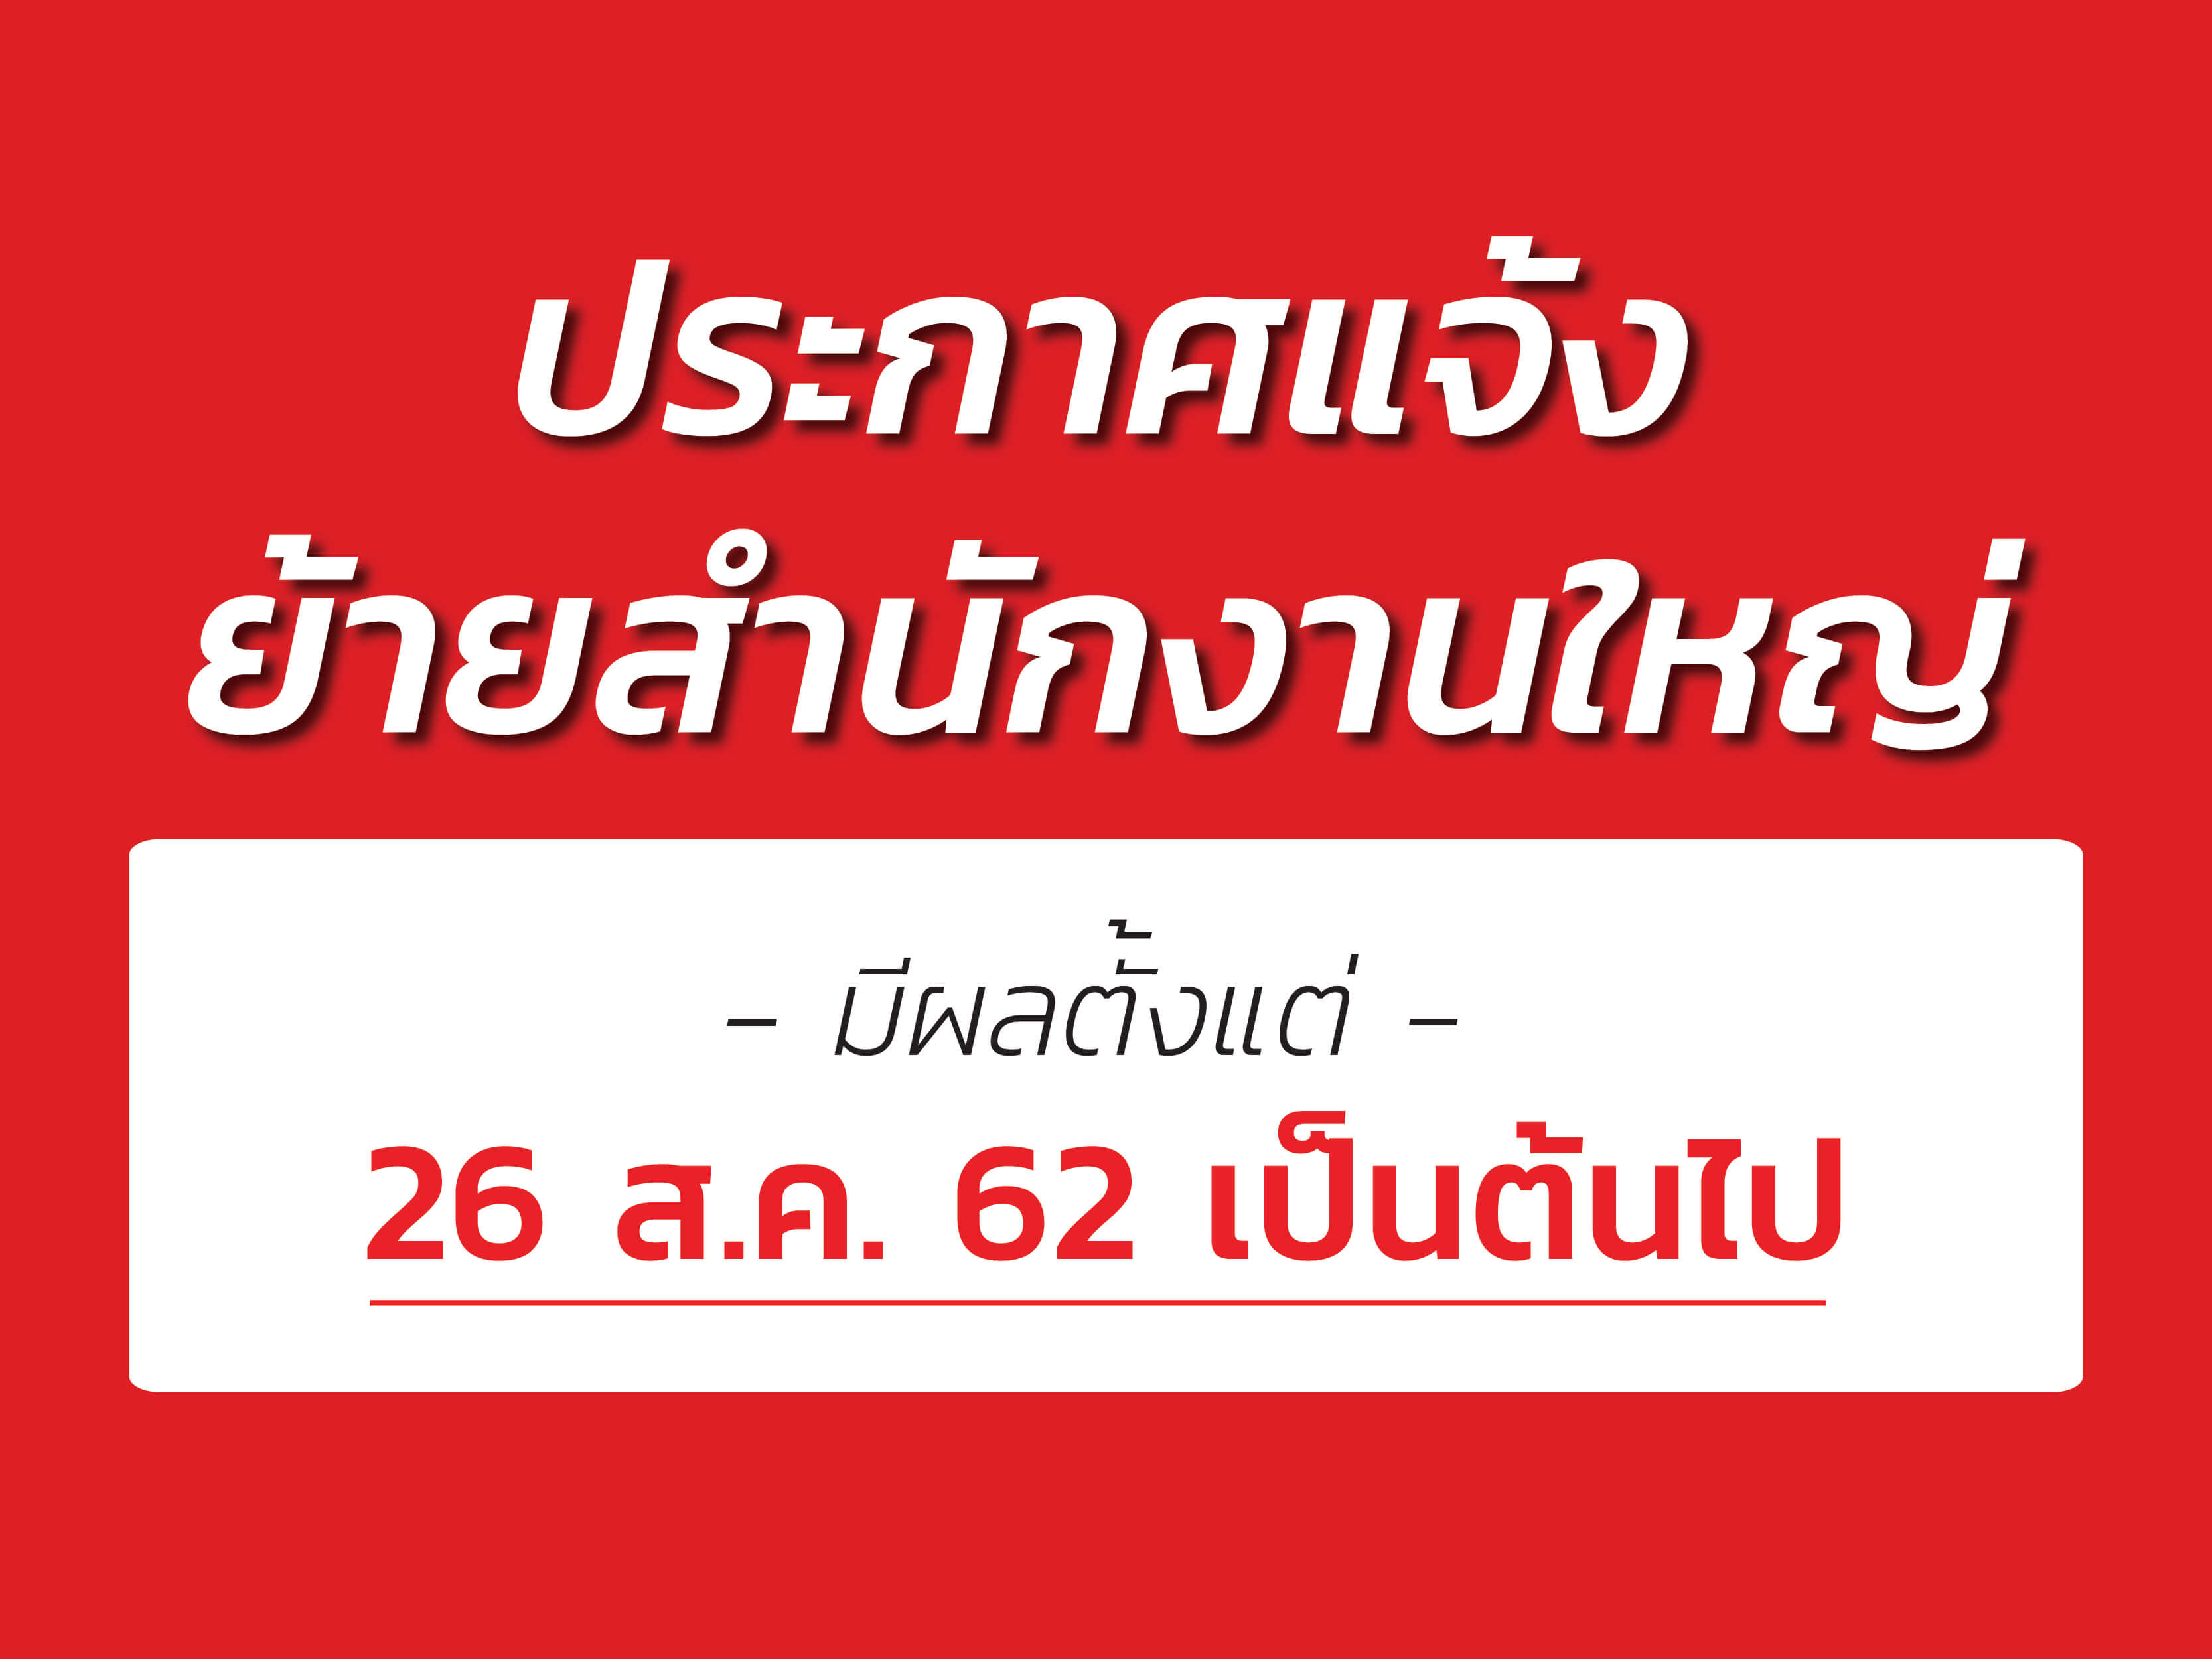 Mitsubishi Electric Factory Automation Thailand - มิตซูบิชิ